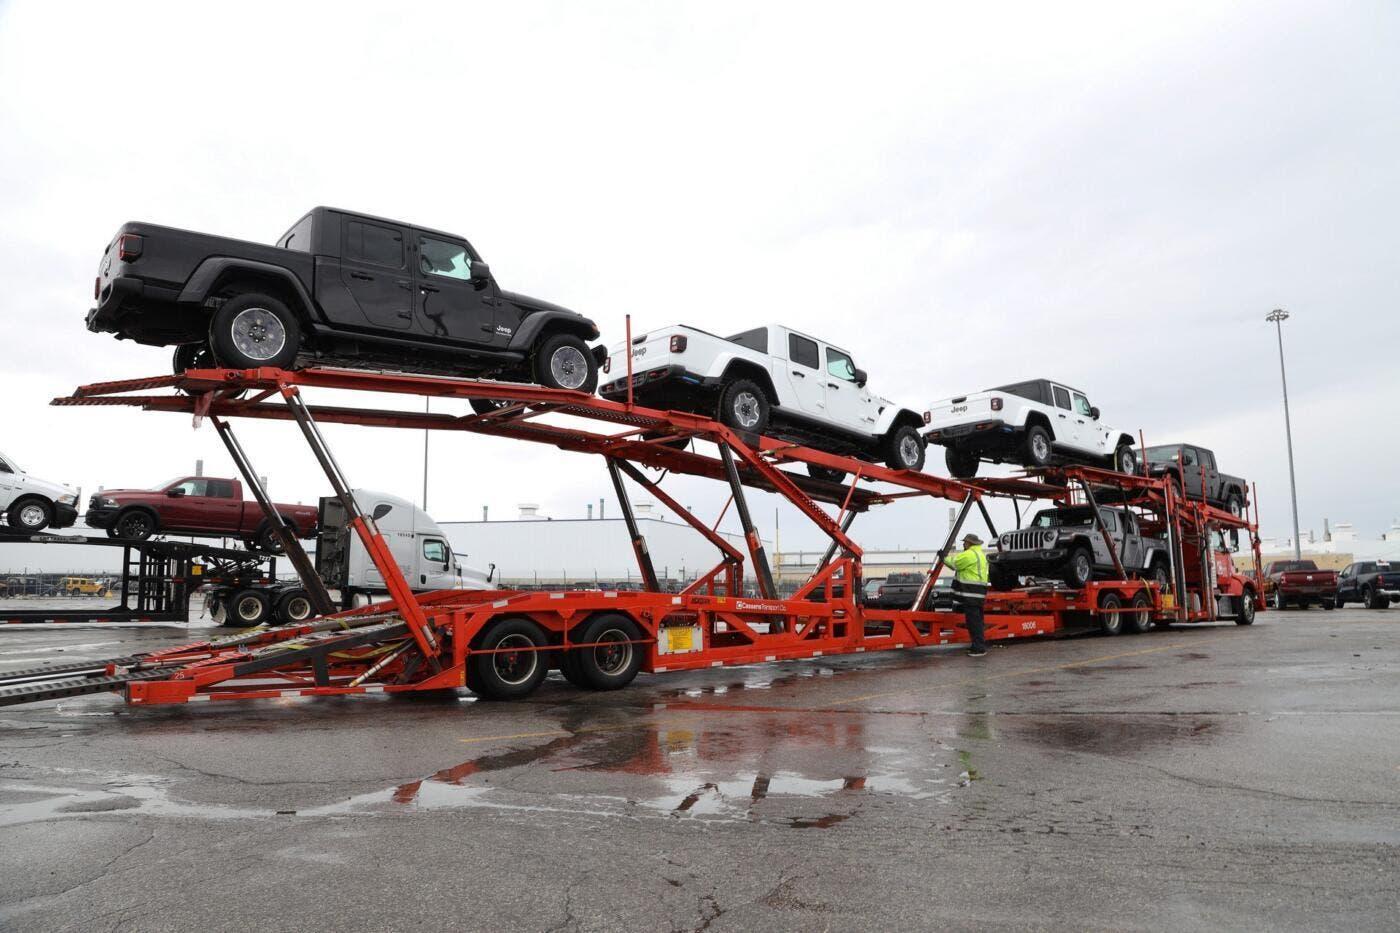 Jeep Gladiator 2020 arrivo concessionarie statunitensi